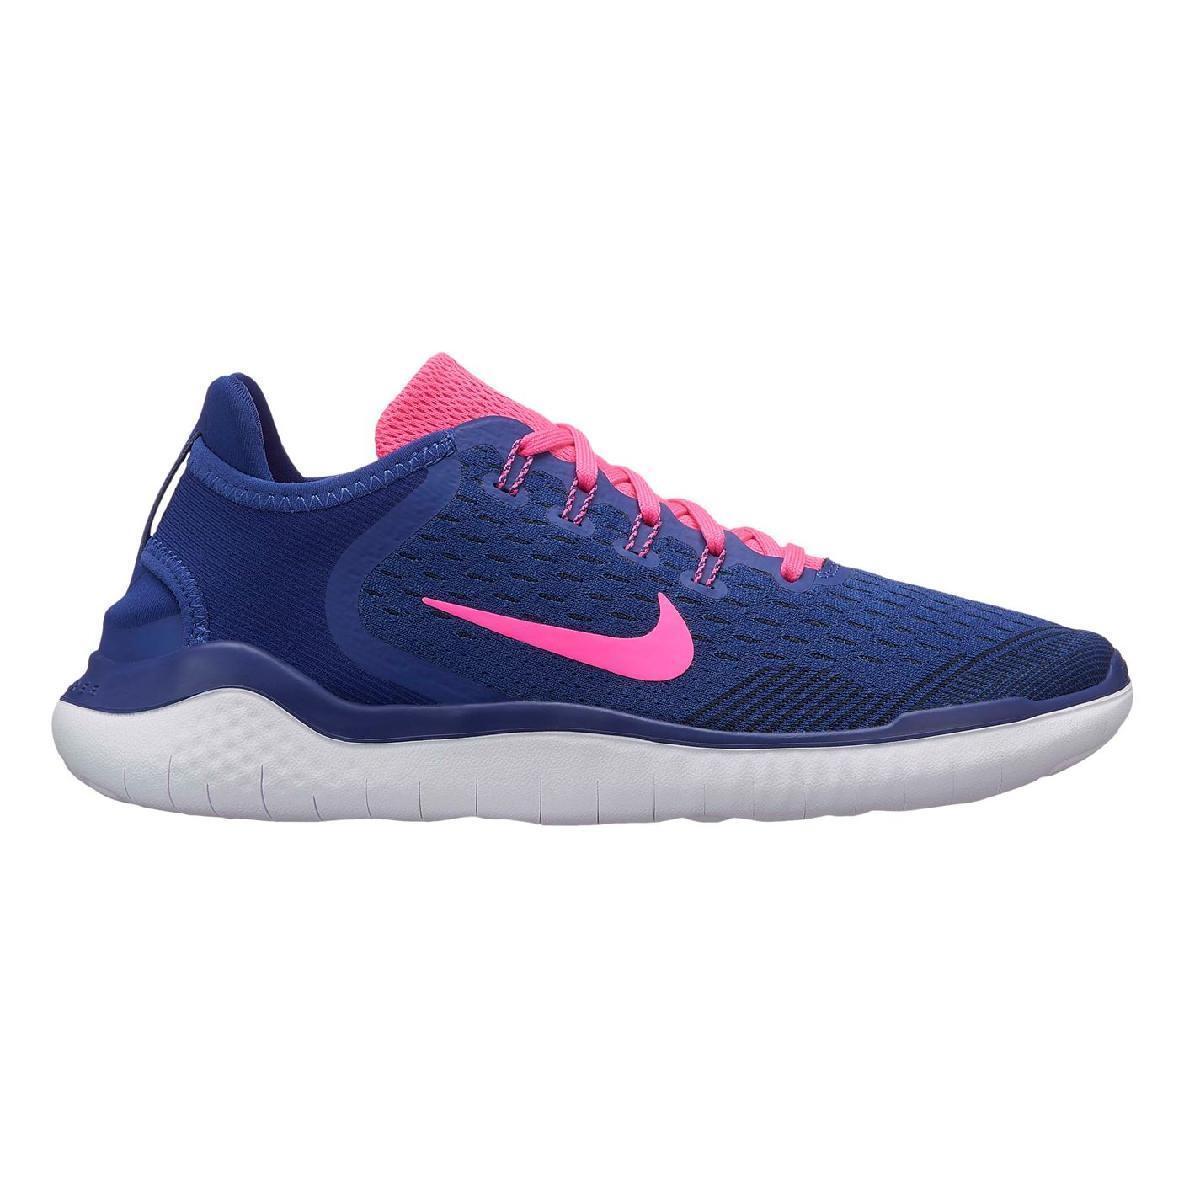 Nike Free Run 2018 Damen Turnschuhe Laufschuhe Turnschuhe Trainers Fitness 4647